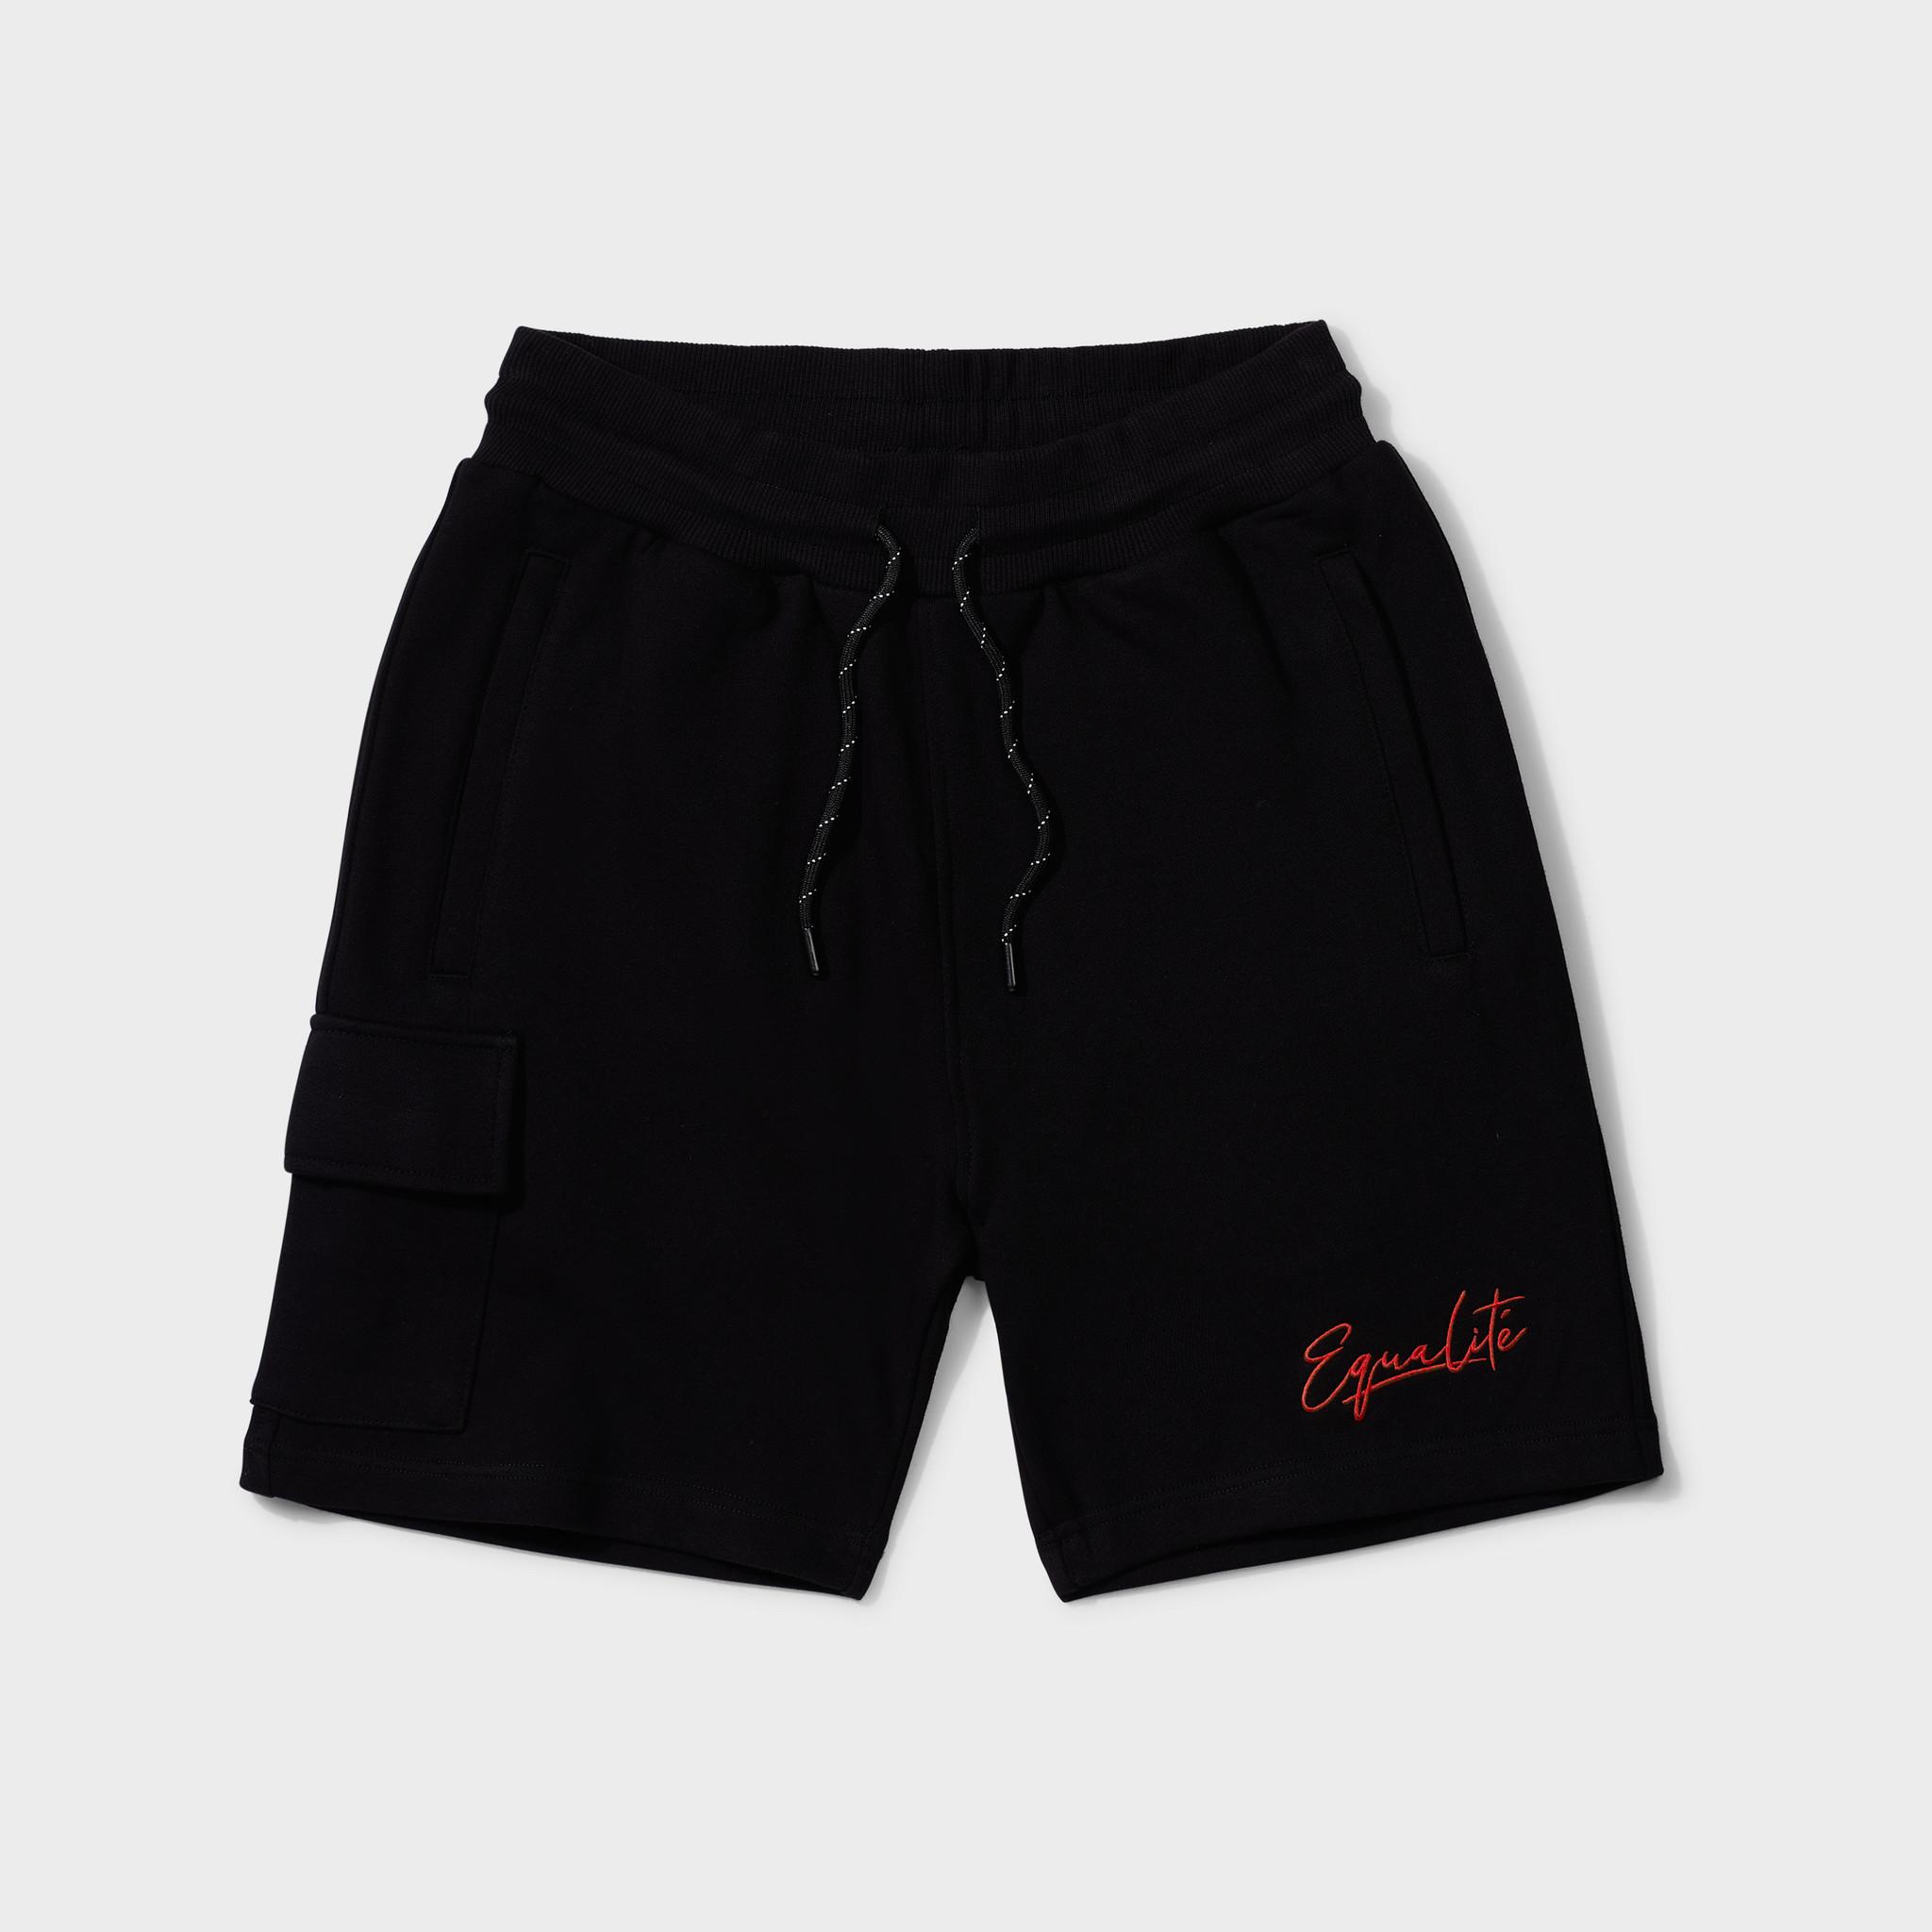 Wafi signature shorts black & red-1